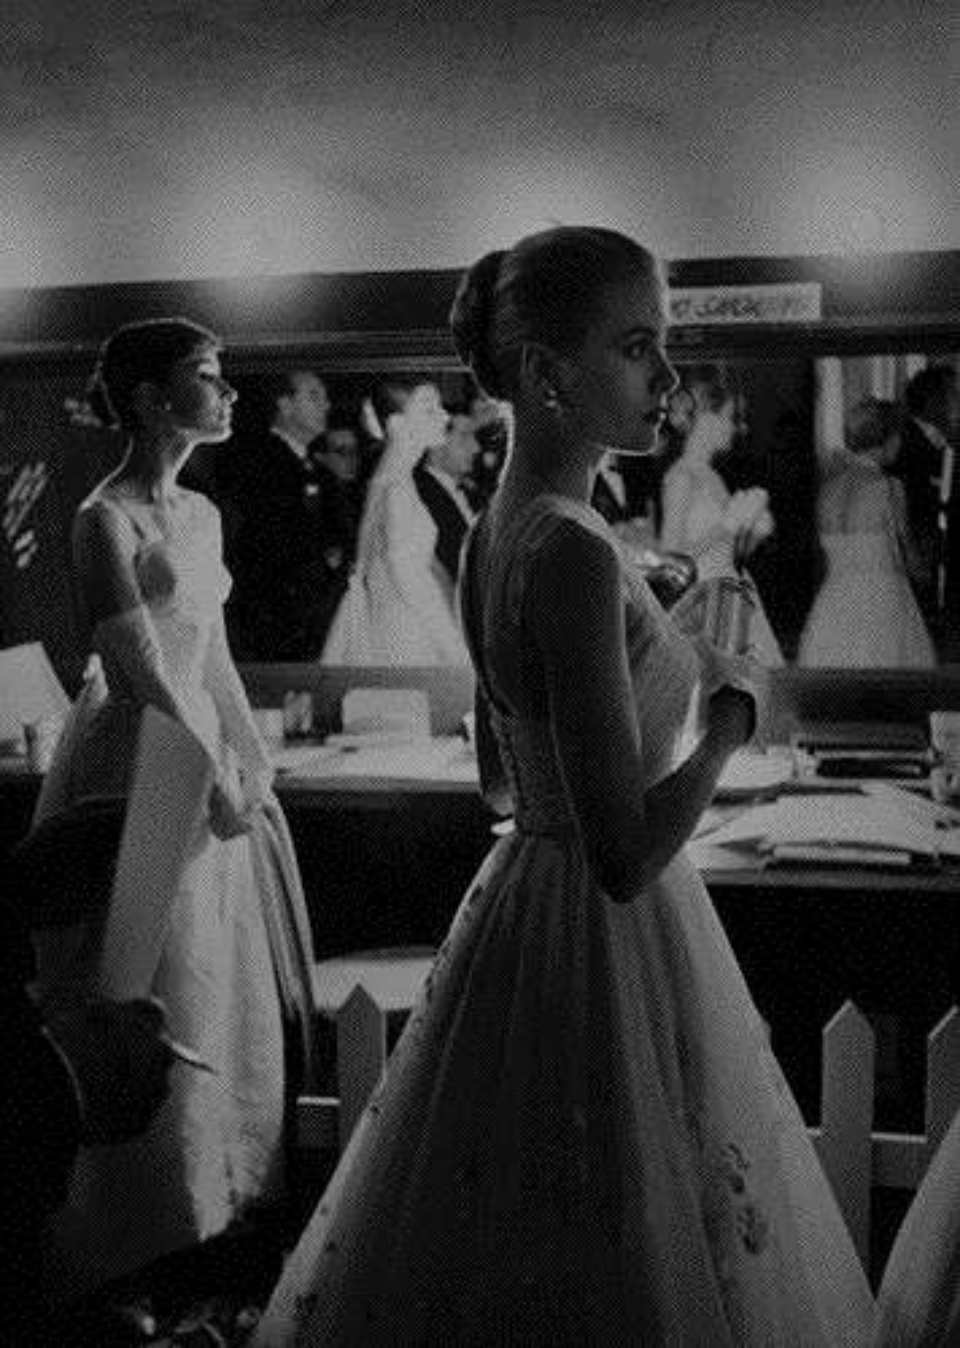 Allan Grant Audrey Hepburn & Grace Kelly Backstage at the Oscars Los Angeles Gelatin Silver Print